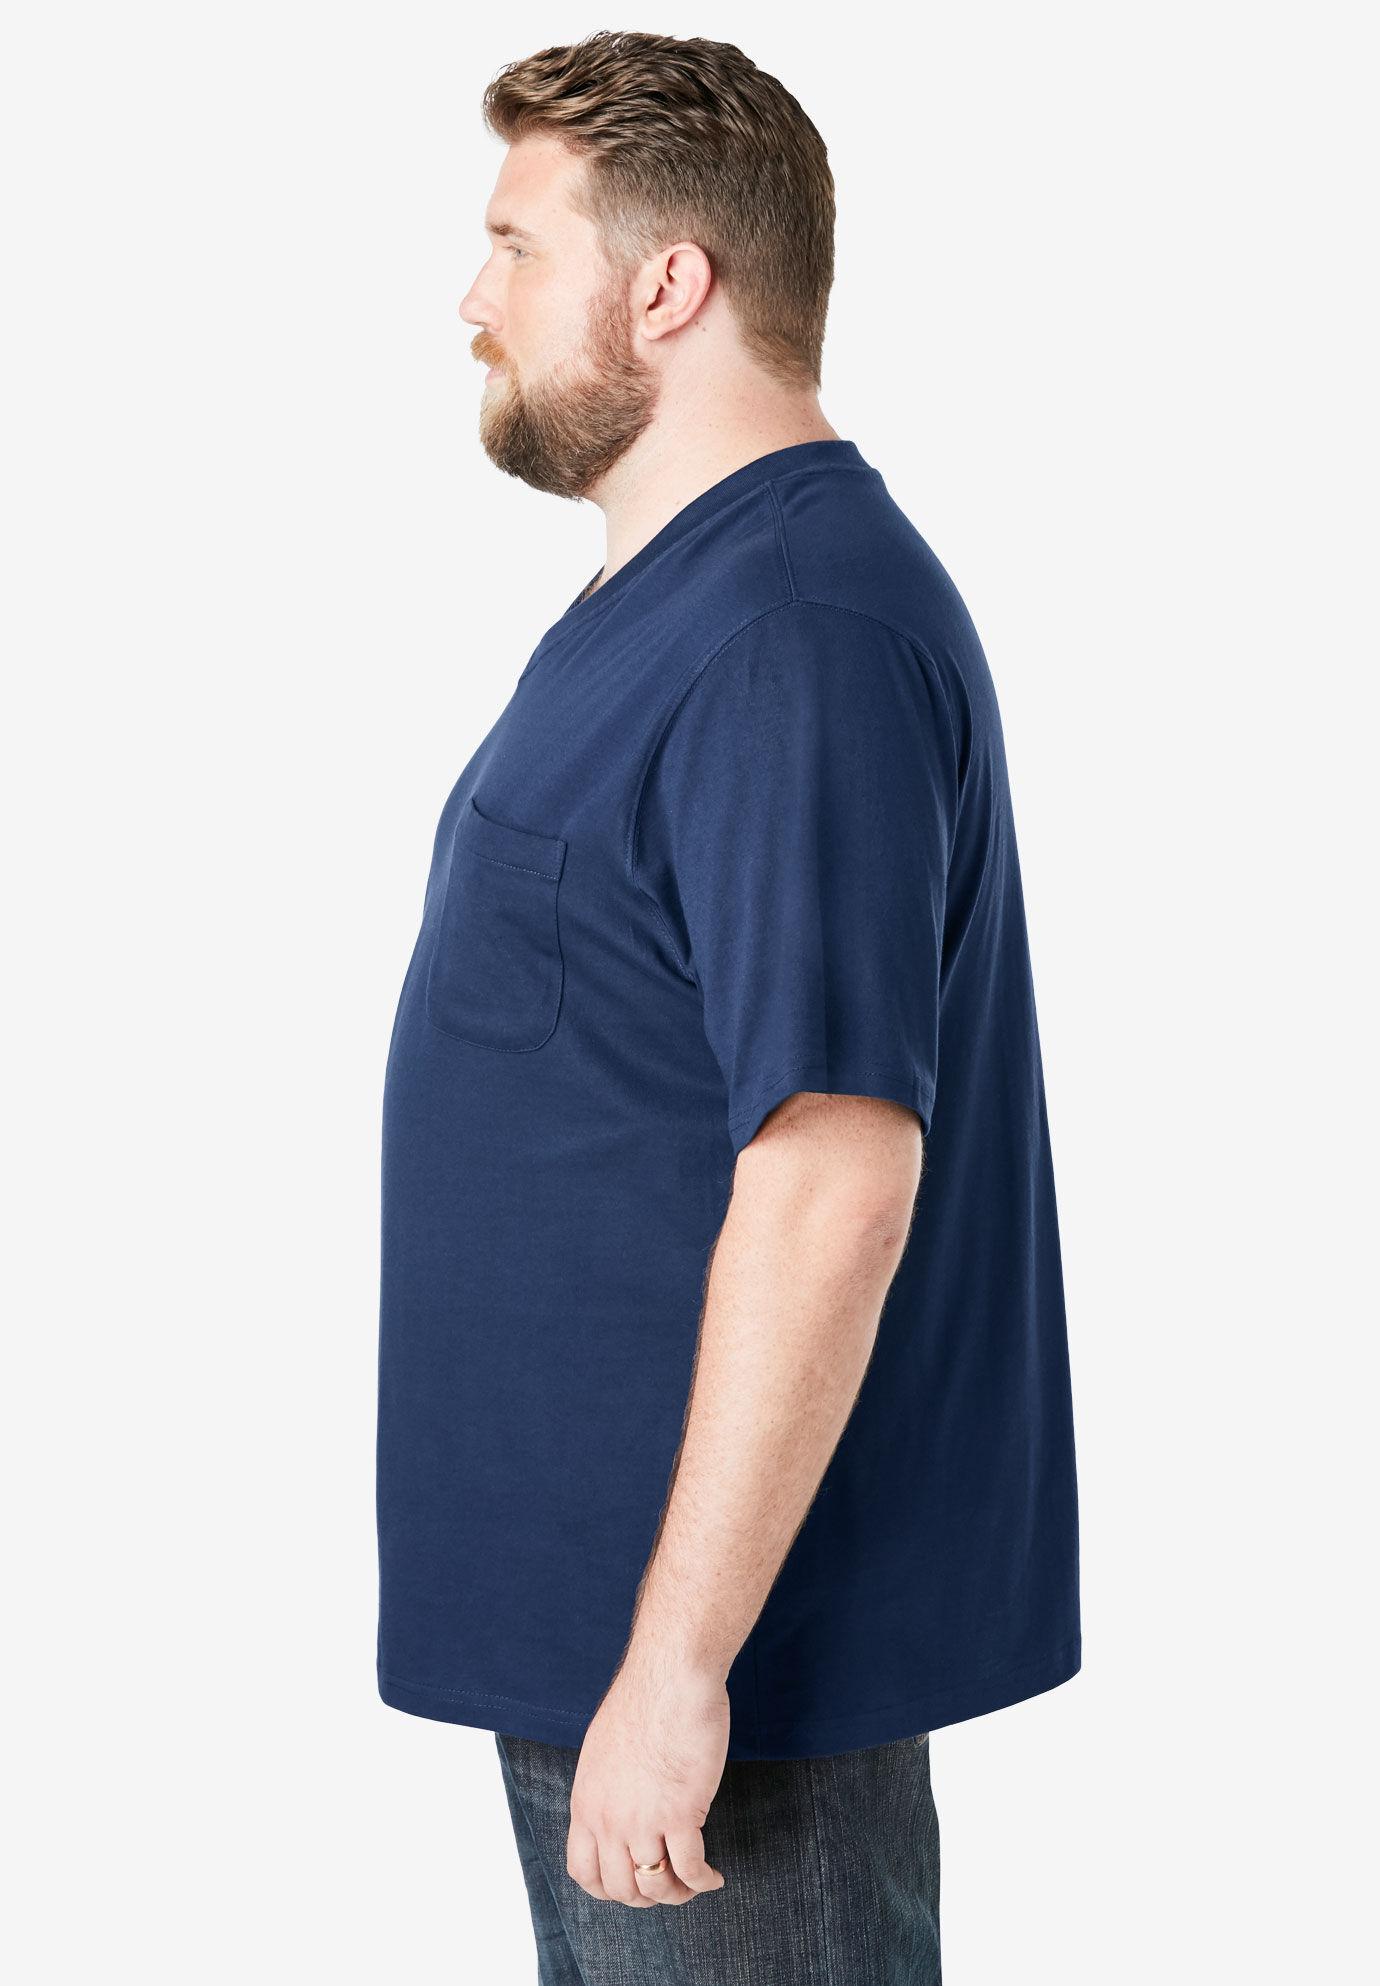 Boulder Creek Mens Big /& Tall Heavyweight Pocket V-Neck Tee